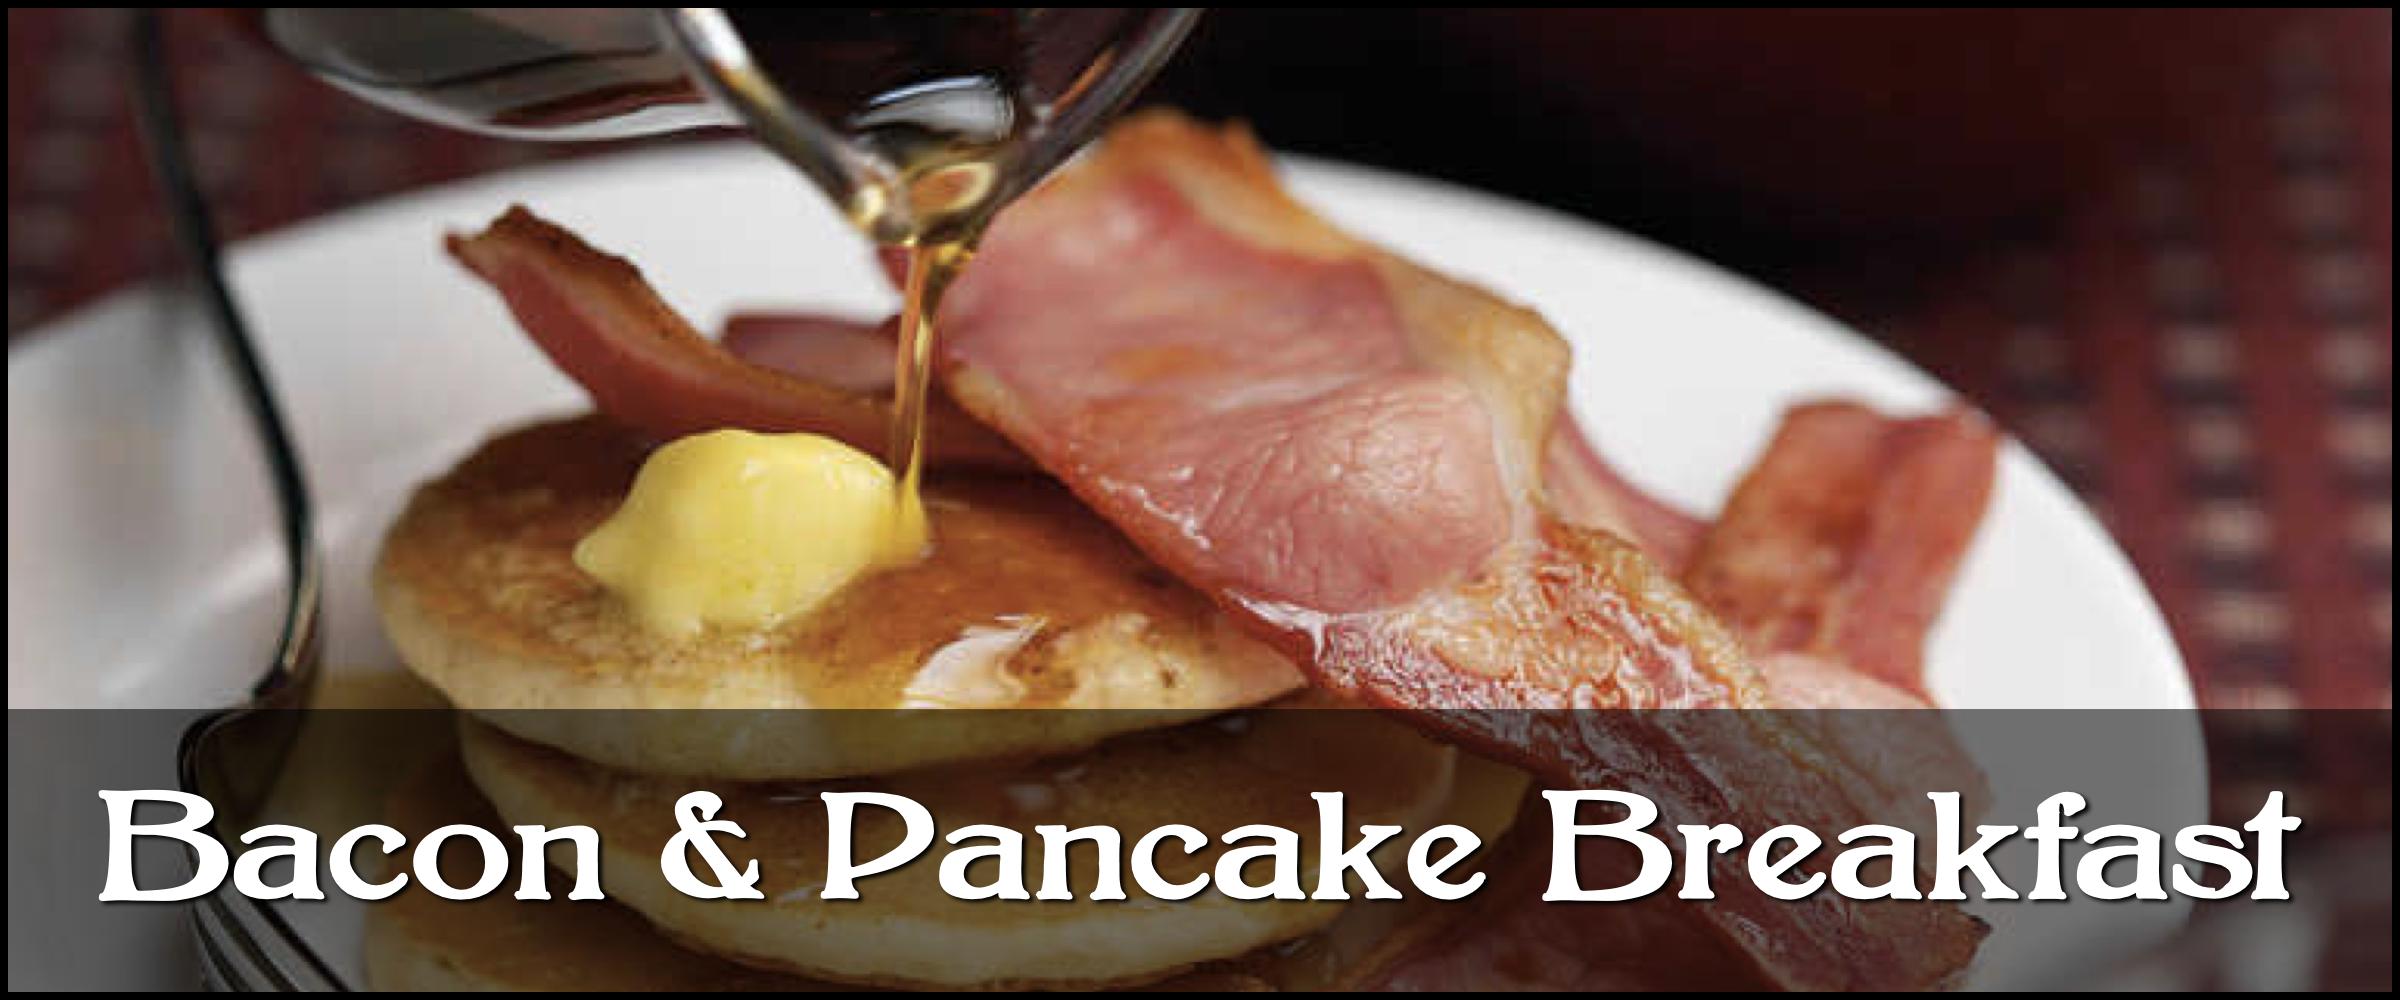 Bacon & Pancake Breakfast.001.png